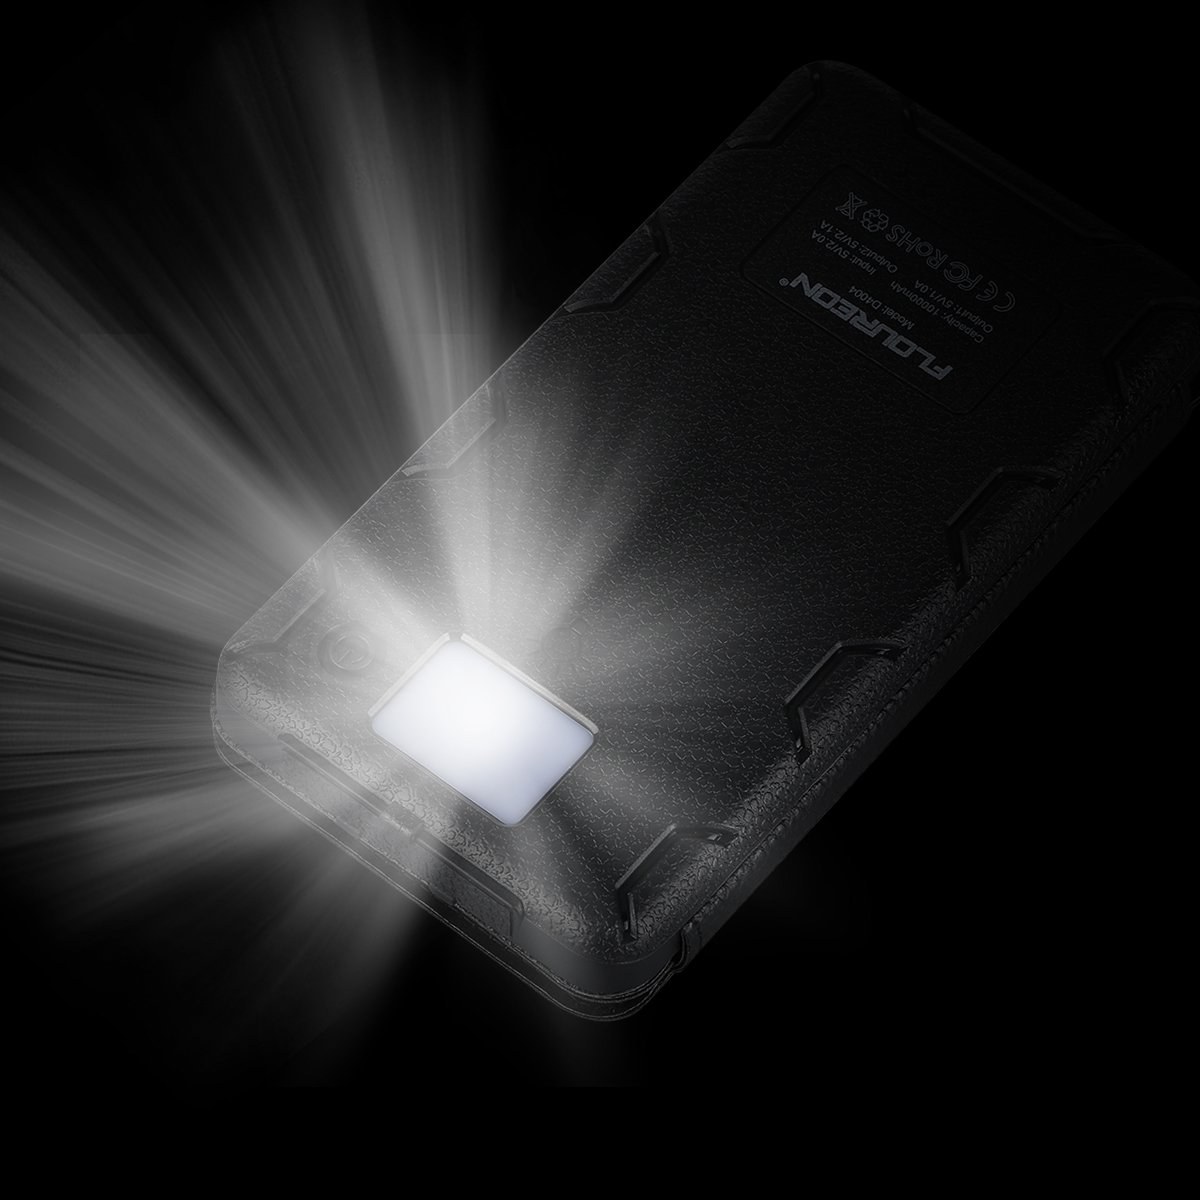 FLOUREON Solar Charger Power Bank 10,000mAh With 1+3PCS Solar Panels Portable Mobile Phone Solar Charger Power Bank Dual USB 1.0A/2.1A Max IP67 Waterproof LED SOS Flashlight